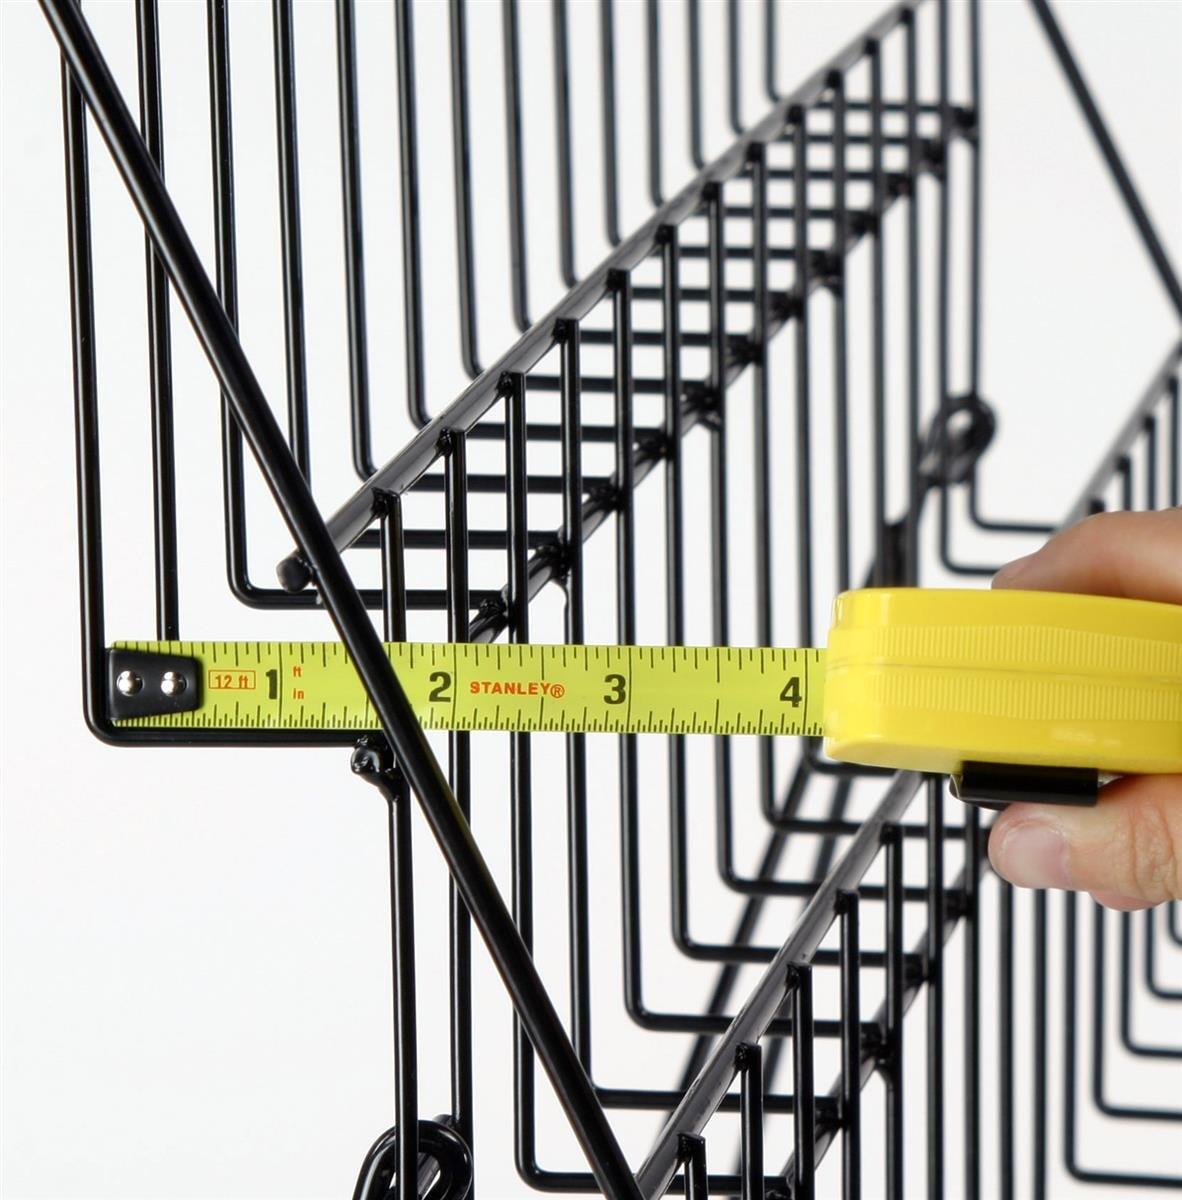 Displays2go Countertop Brochure/Magazine Rack, 6-Tier Organizer, Black Steel (WRC6T2915) by Displays2go (Image #3)